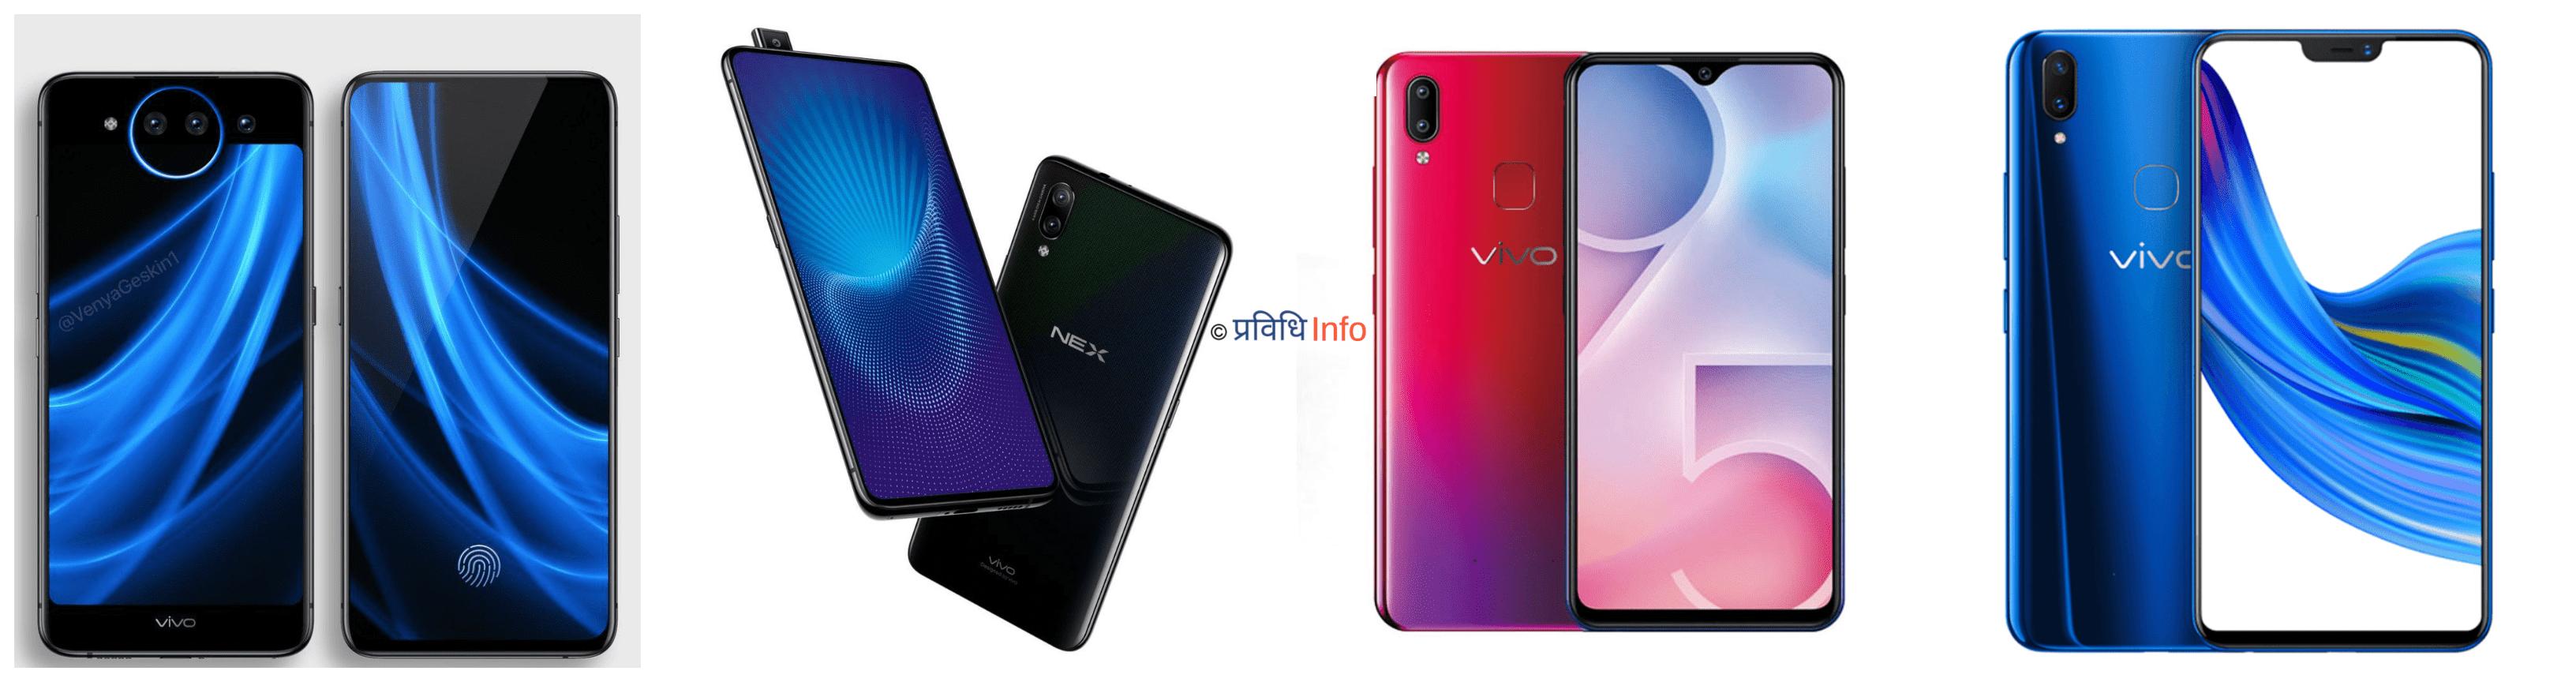 VIVO Mobile Price 2019